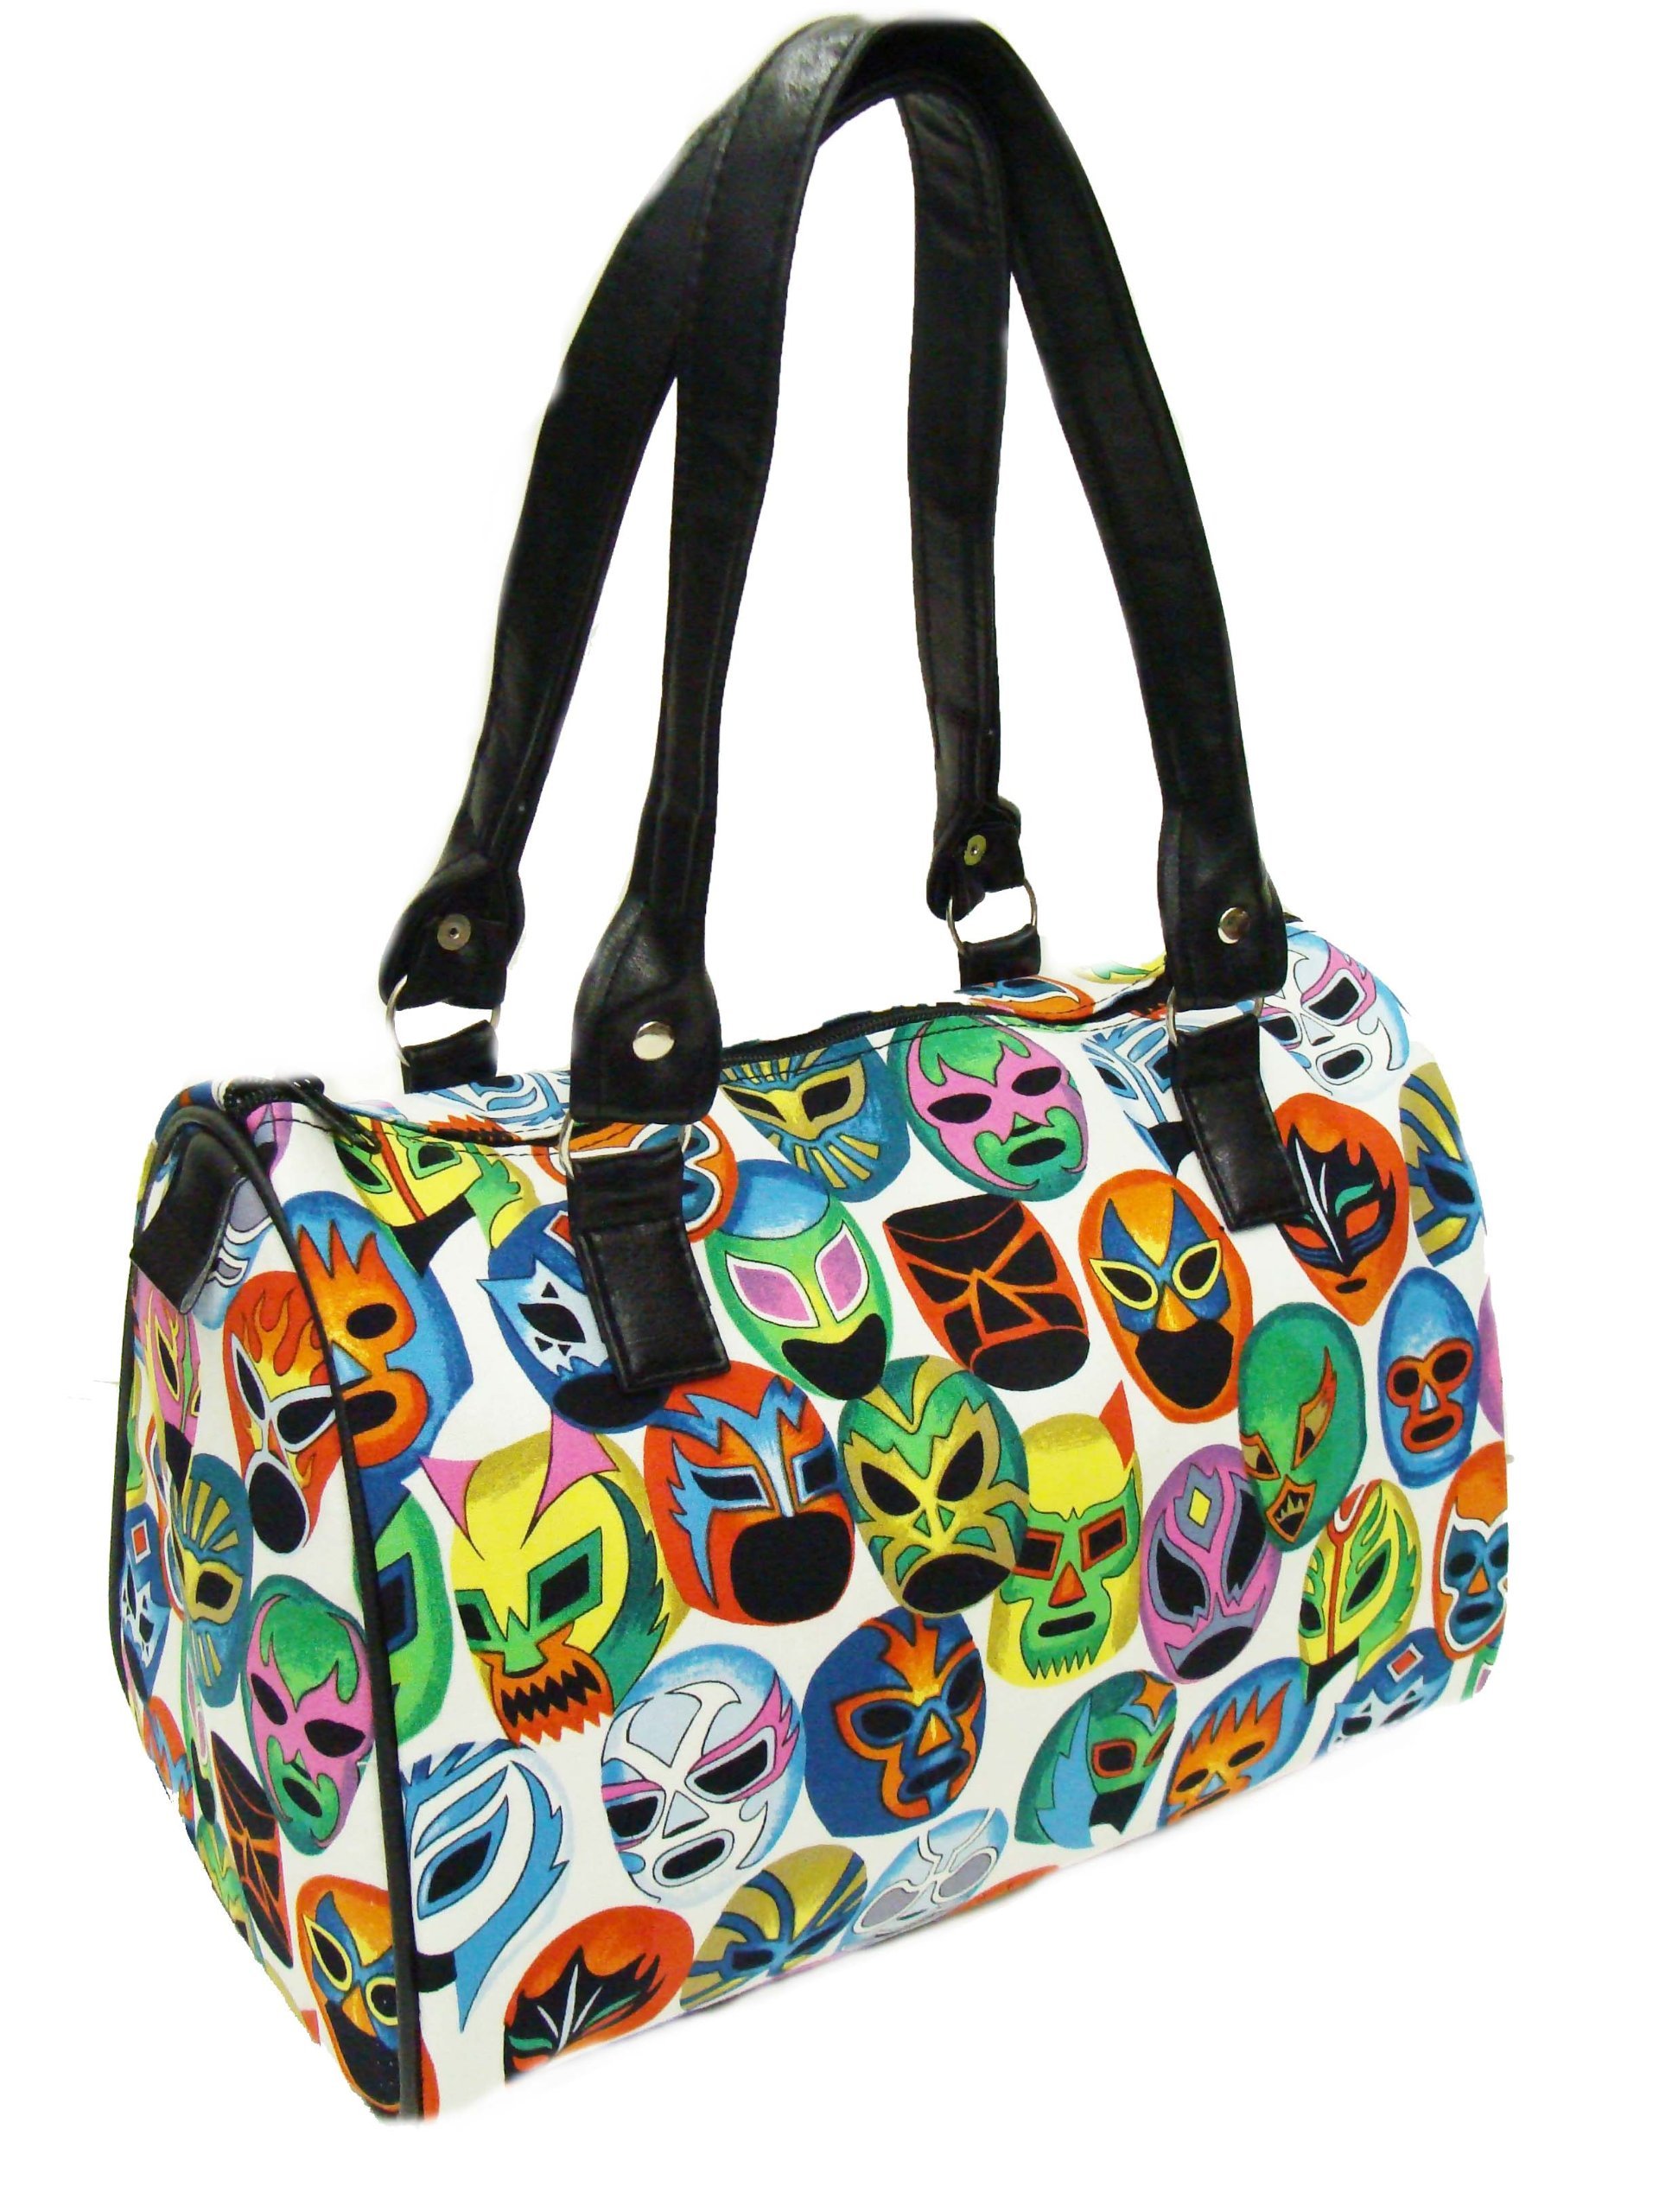 US Handmade Fashion MASCARAS DE PELEA Halloween Gothic LATINO Pattern Doctor Bag Satchel Style handmade purse cotton fabric, DRB 1545 by US HANDMADE FASHION